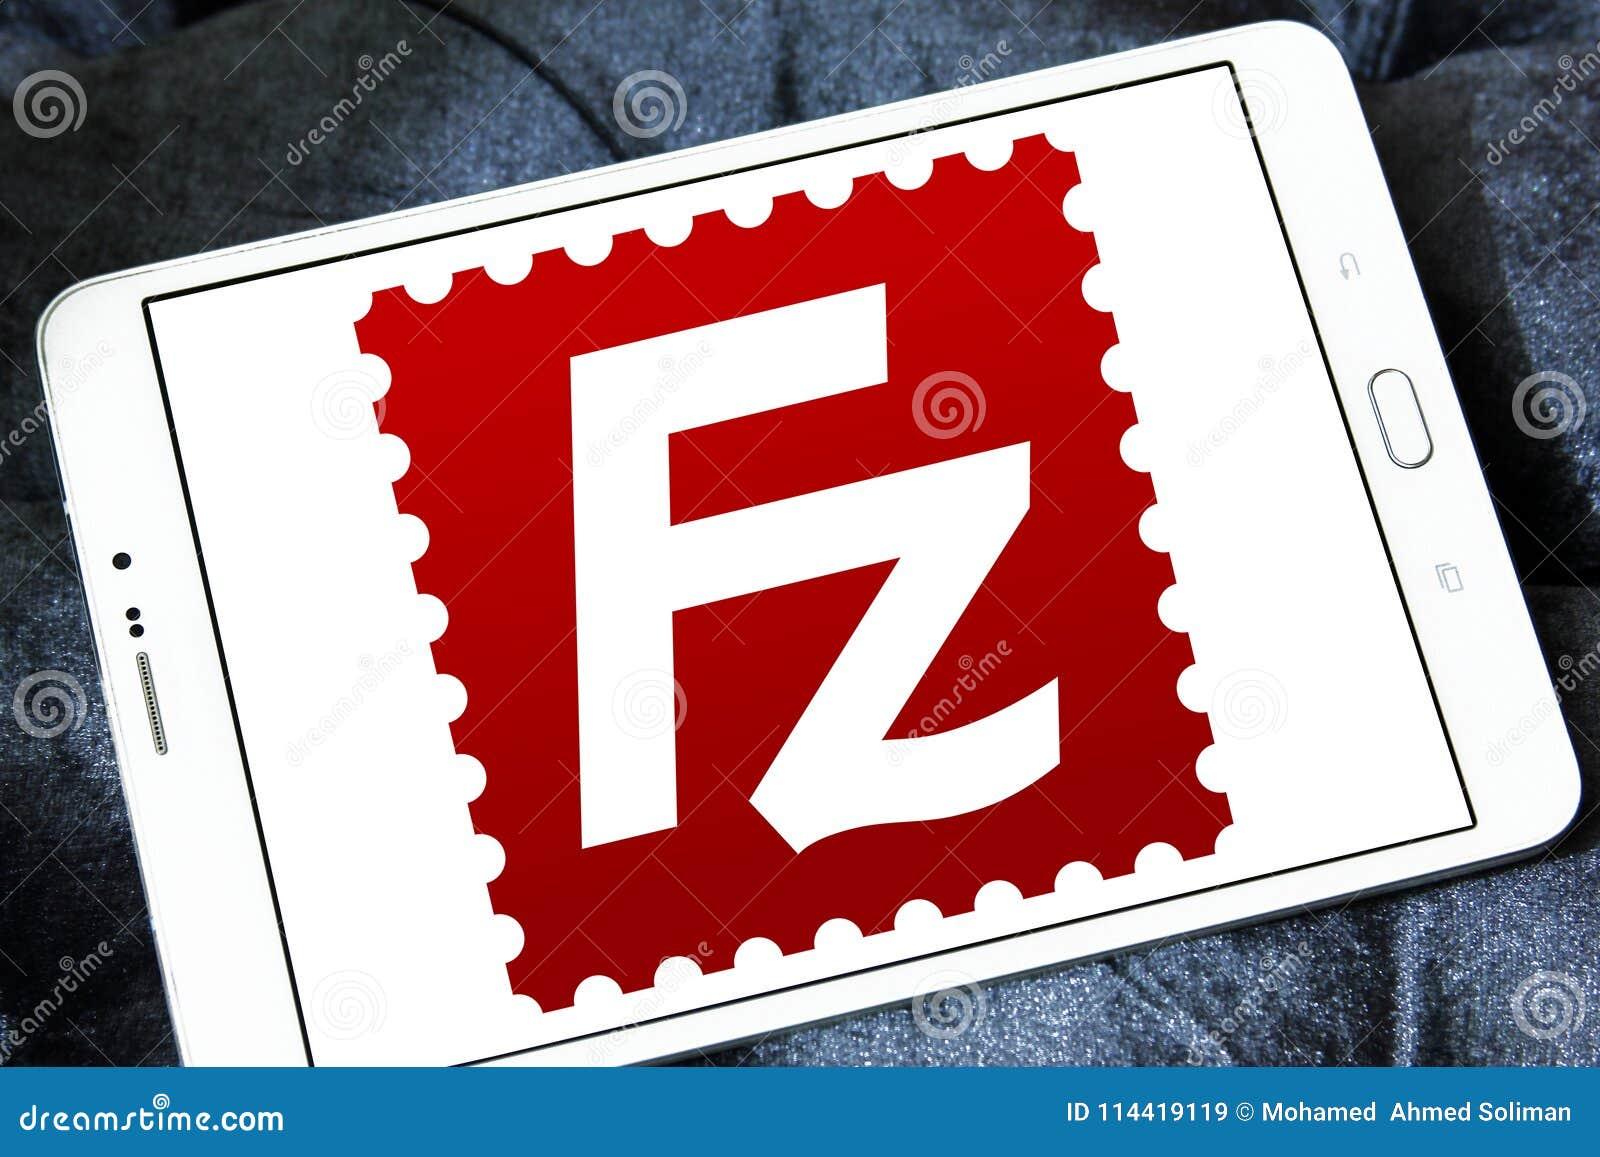 free software cross-platform ftp application